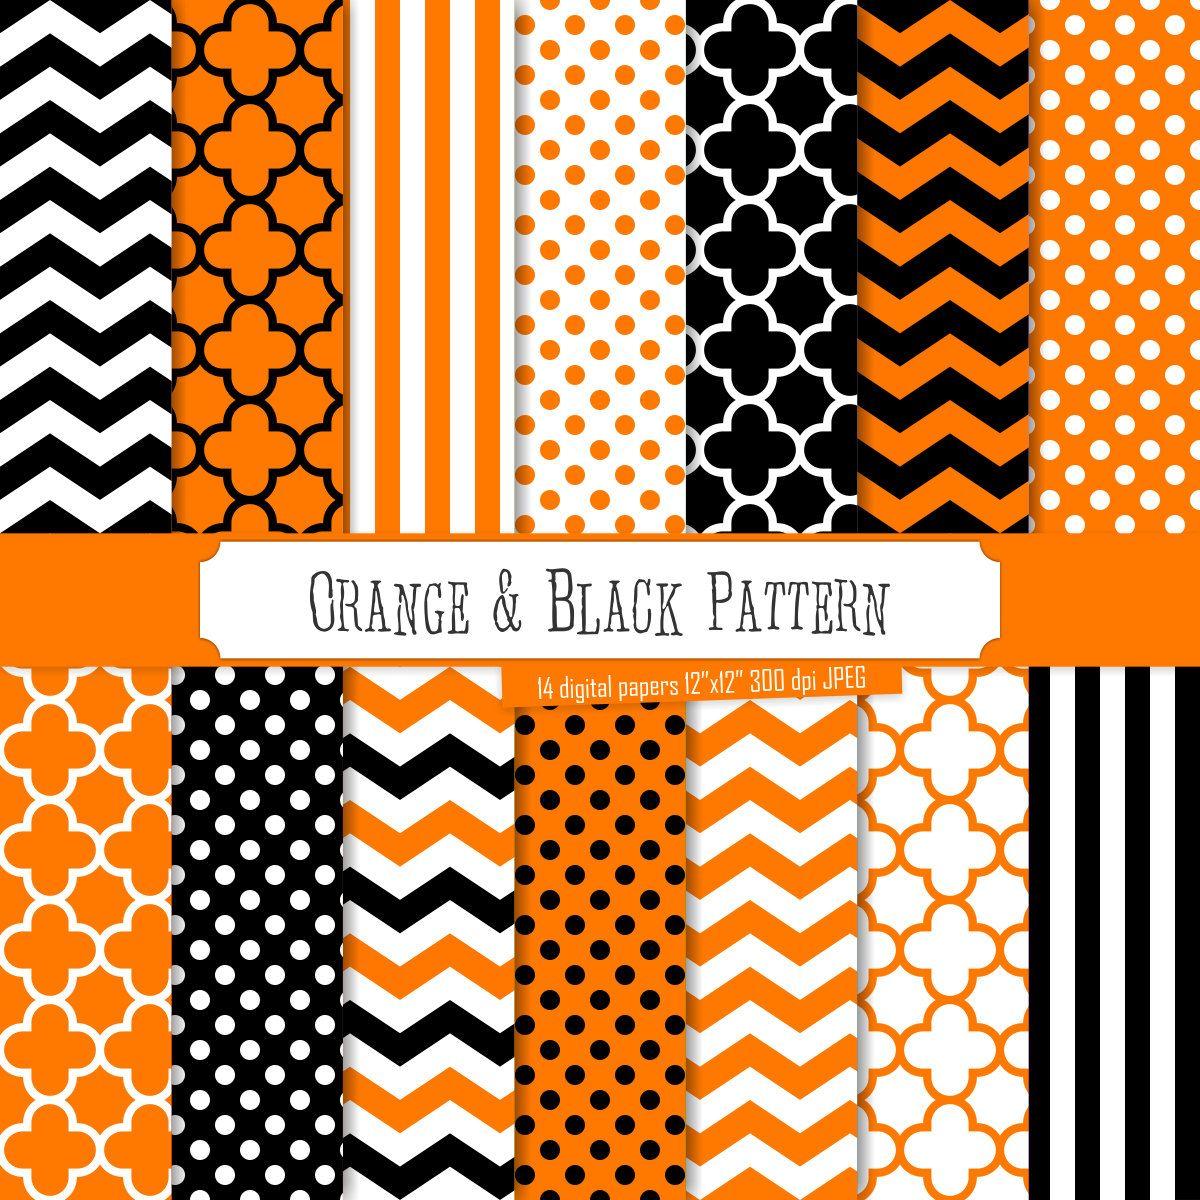 digital paper orange black pattern halloween theme - Black And Orange Halloween